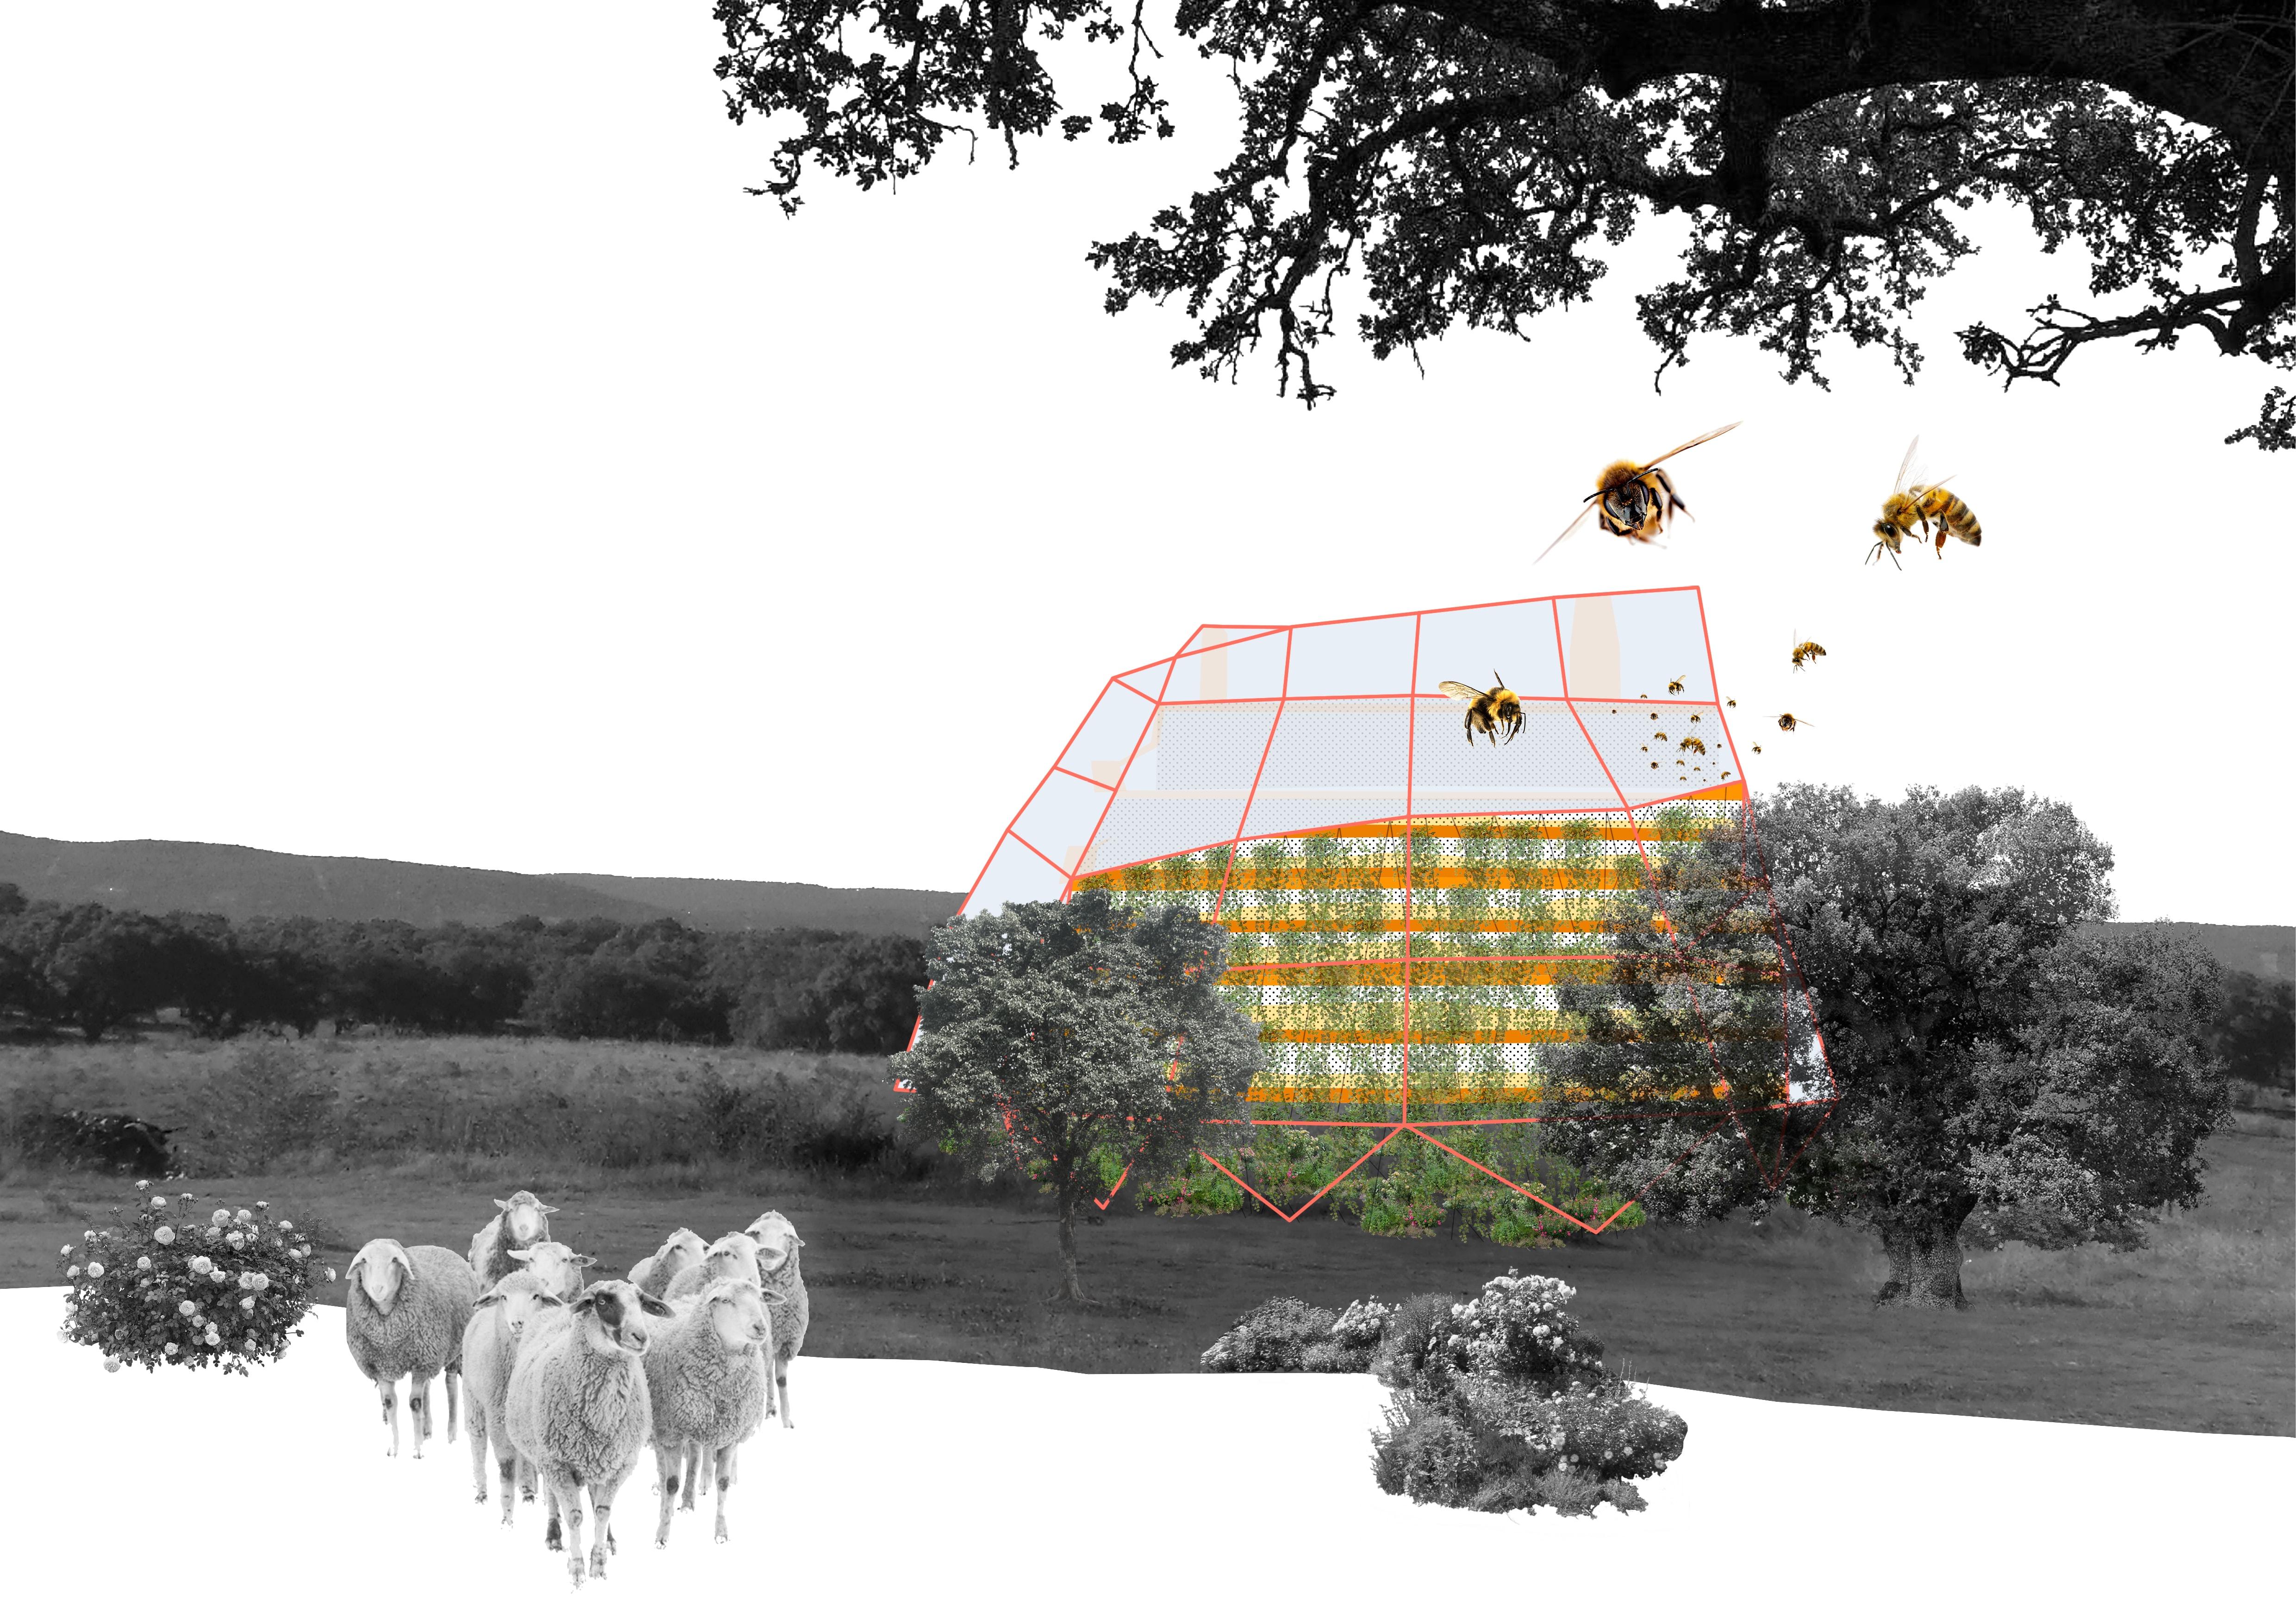 14_Landscape Reference Collage 3